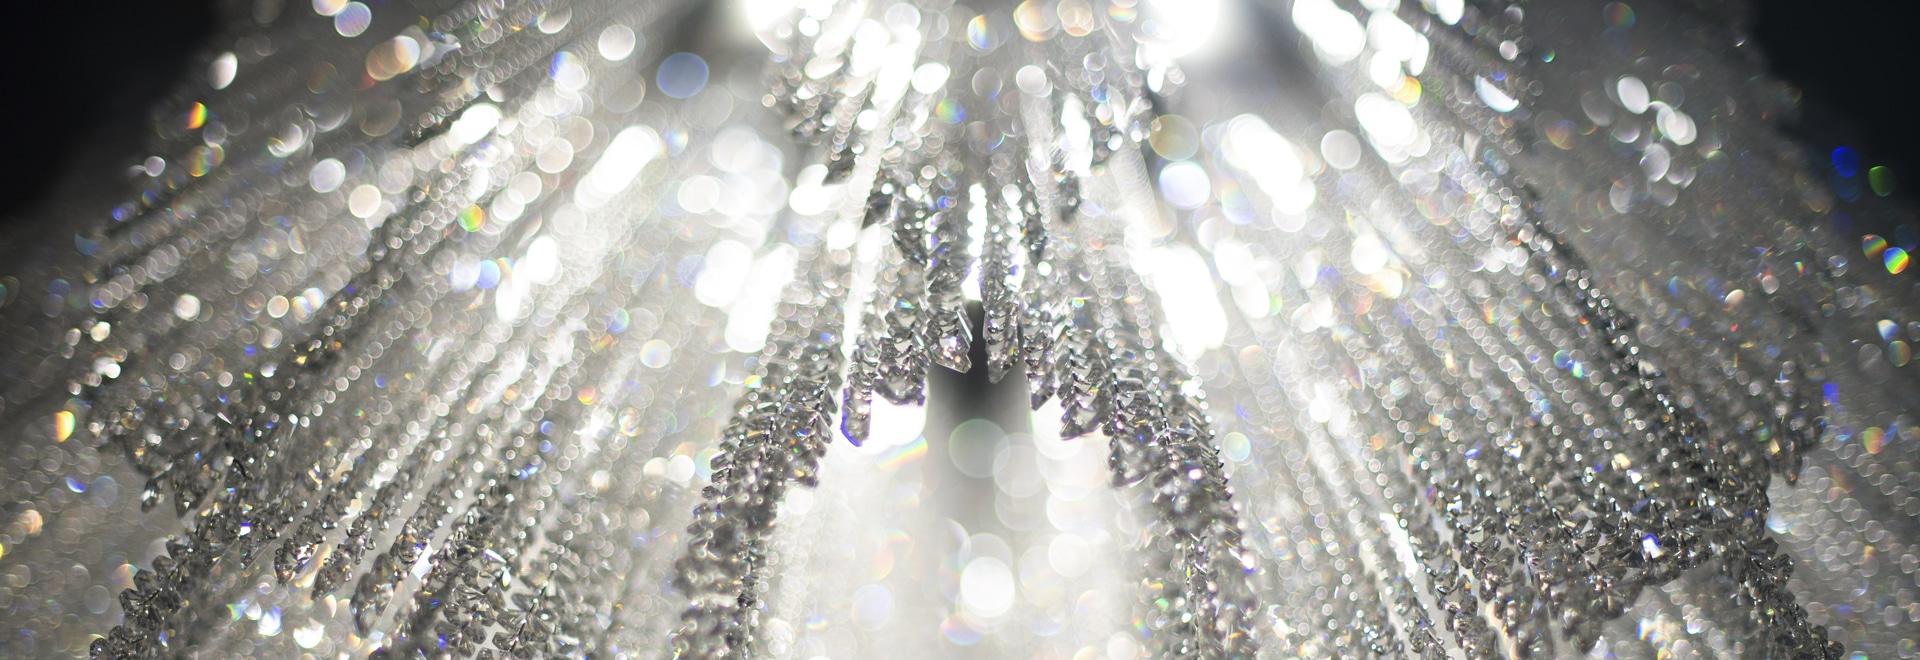 Burj crystal chandelier